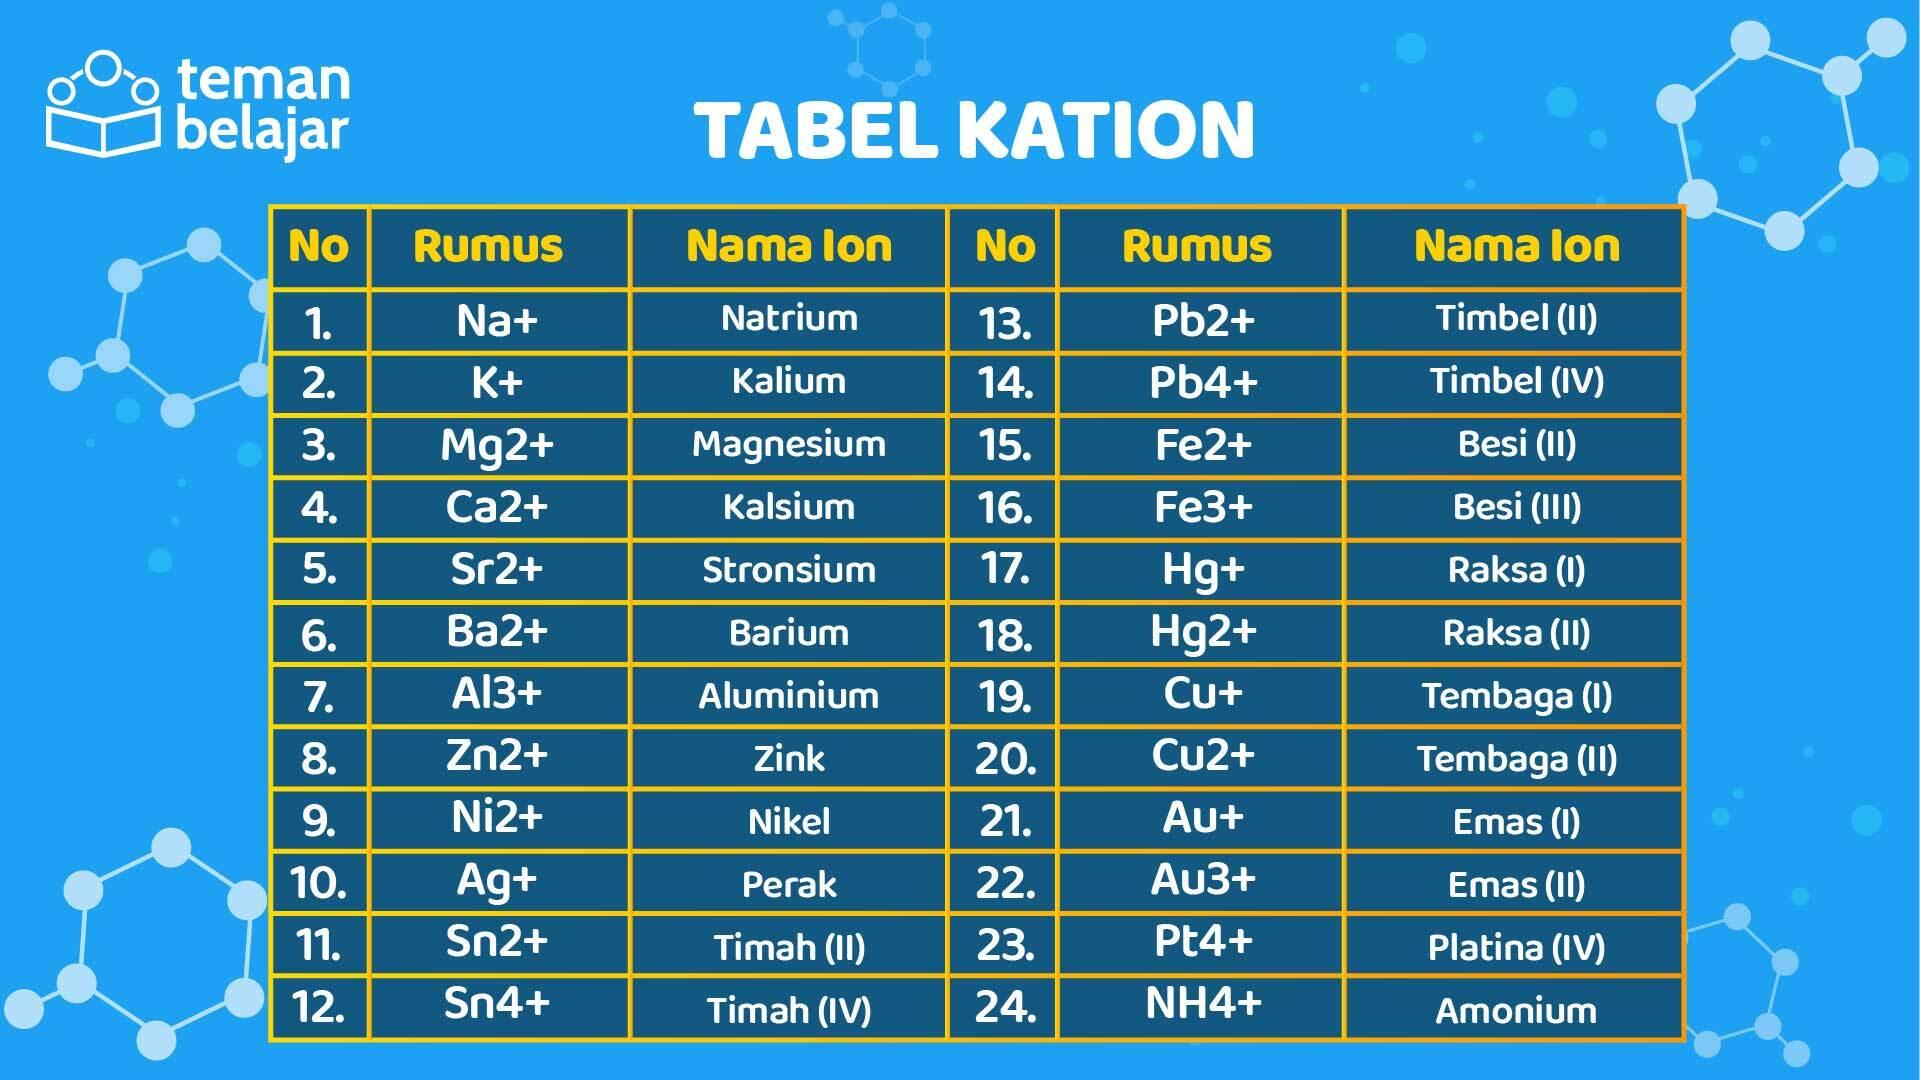 Tabel Kation | Teman Belajar